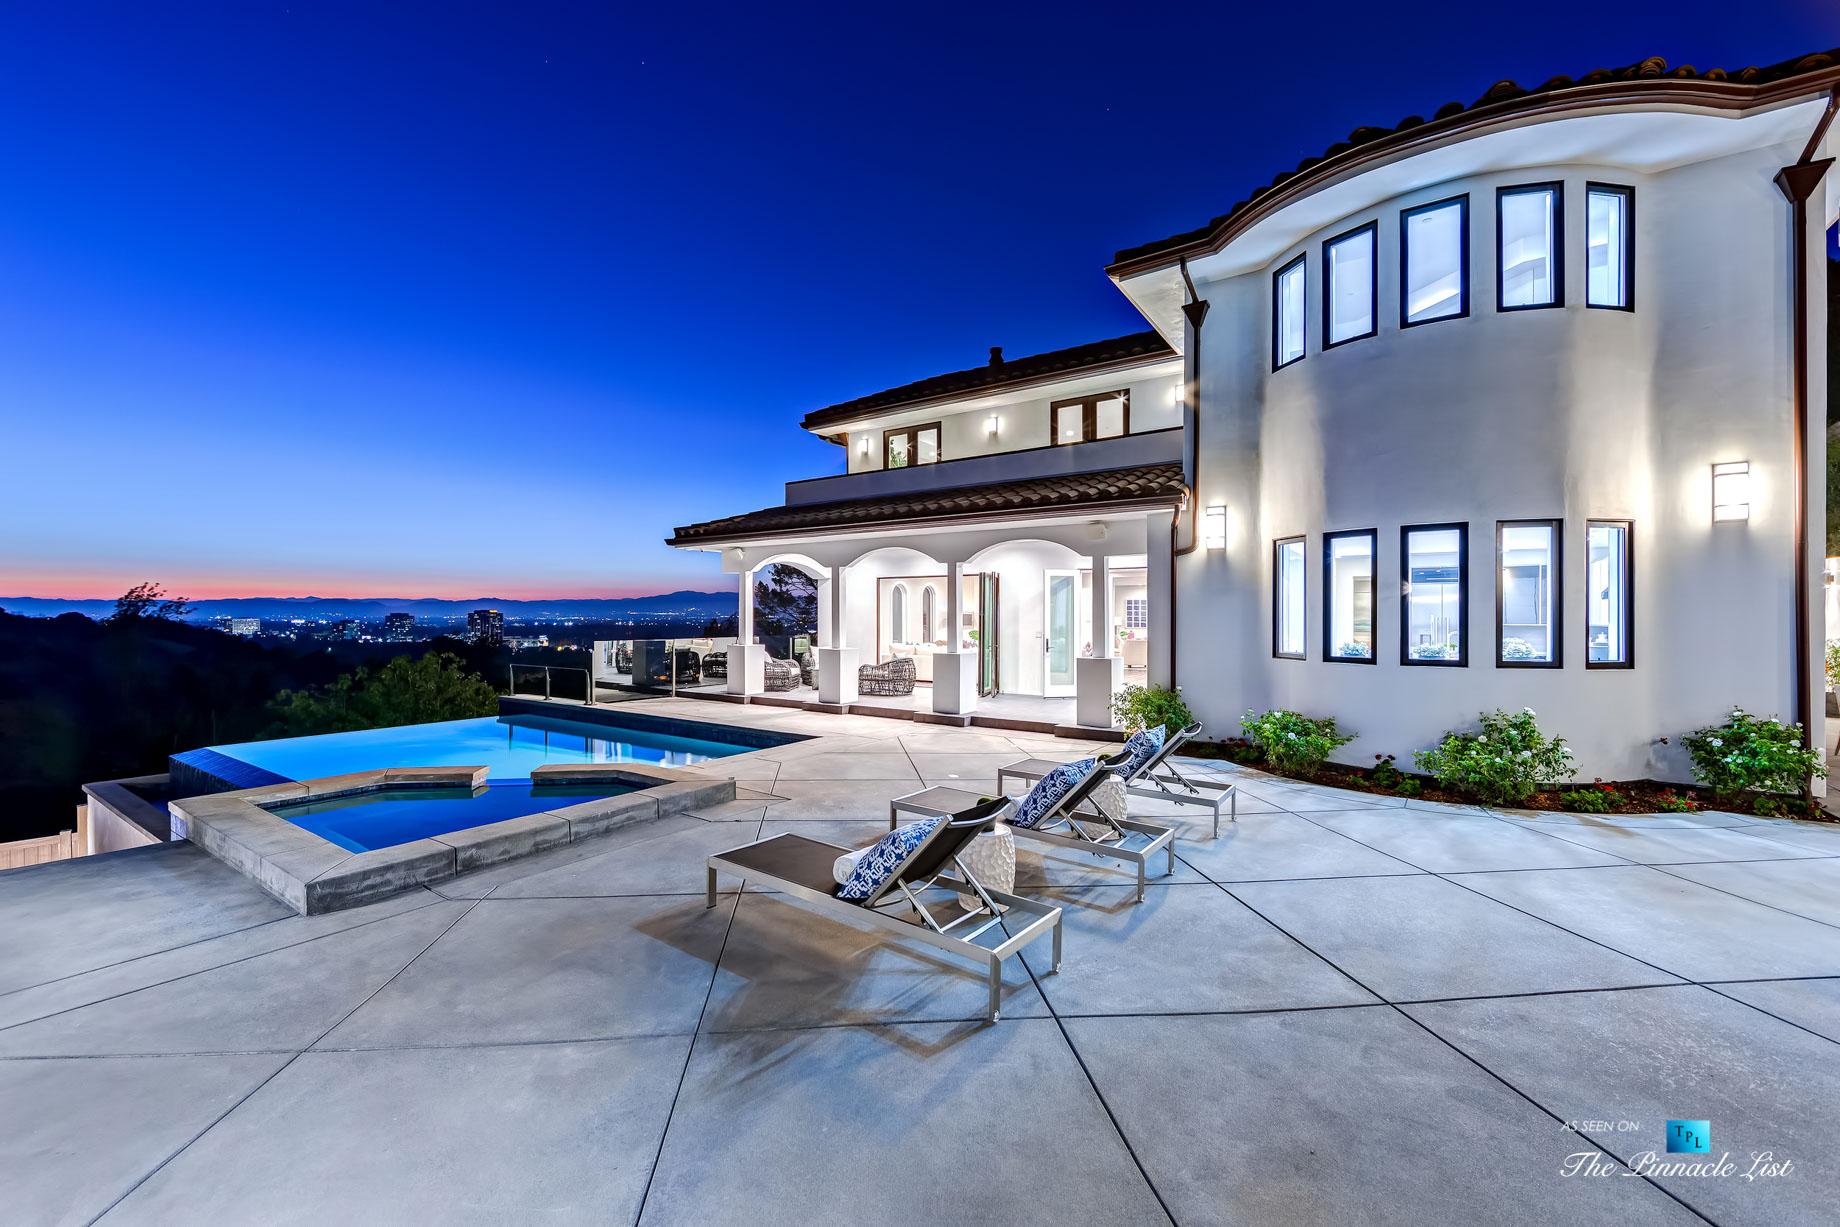 083 – 15234 Rayneta Drive, Sherman Oaks, CA, USA